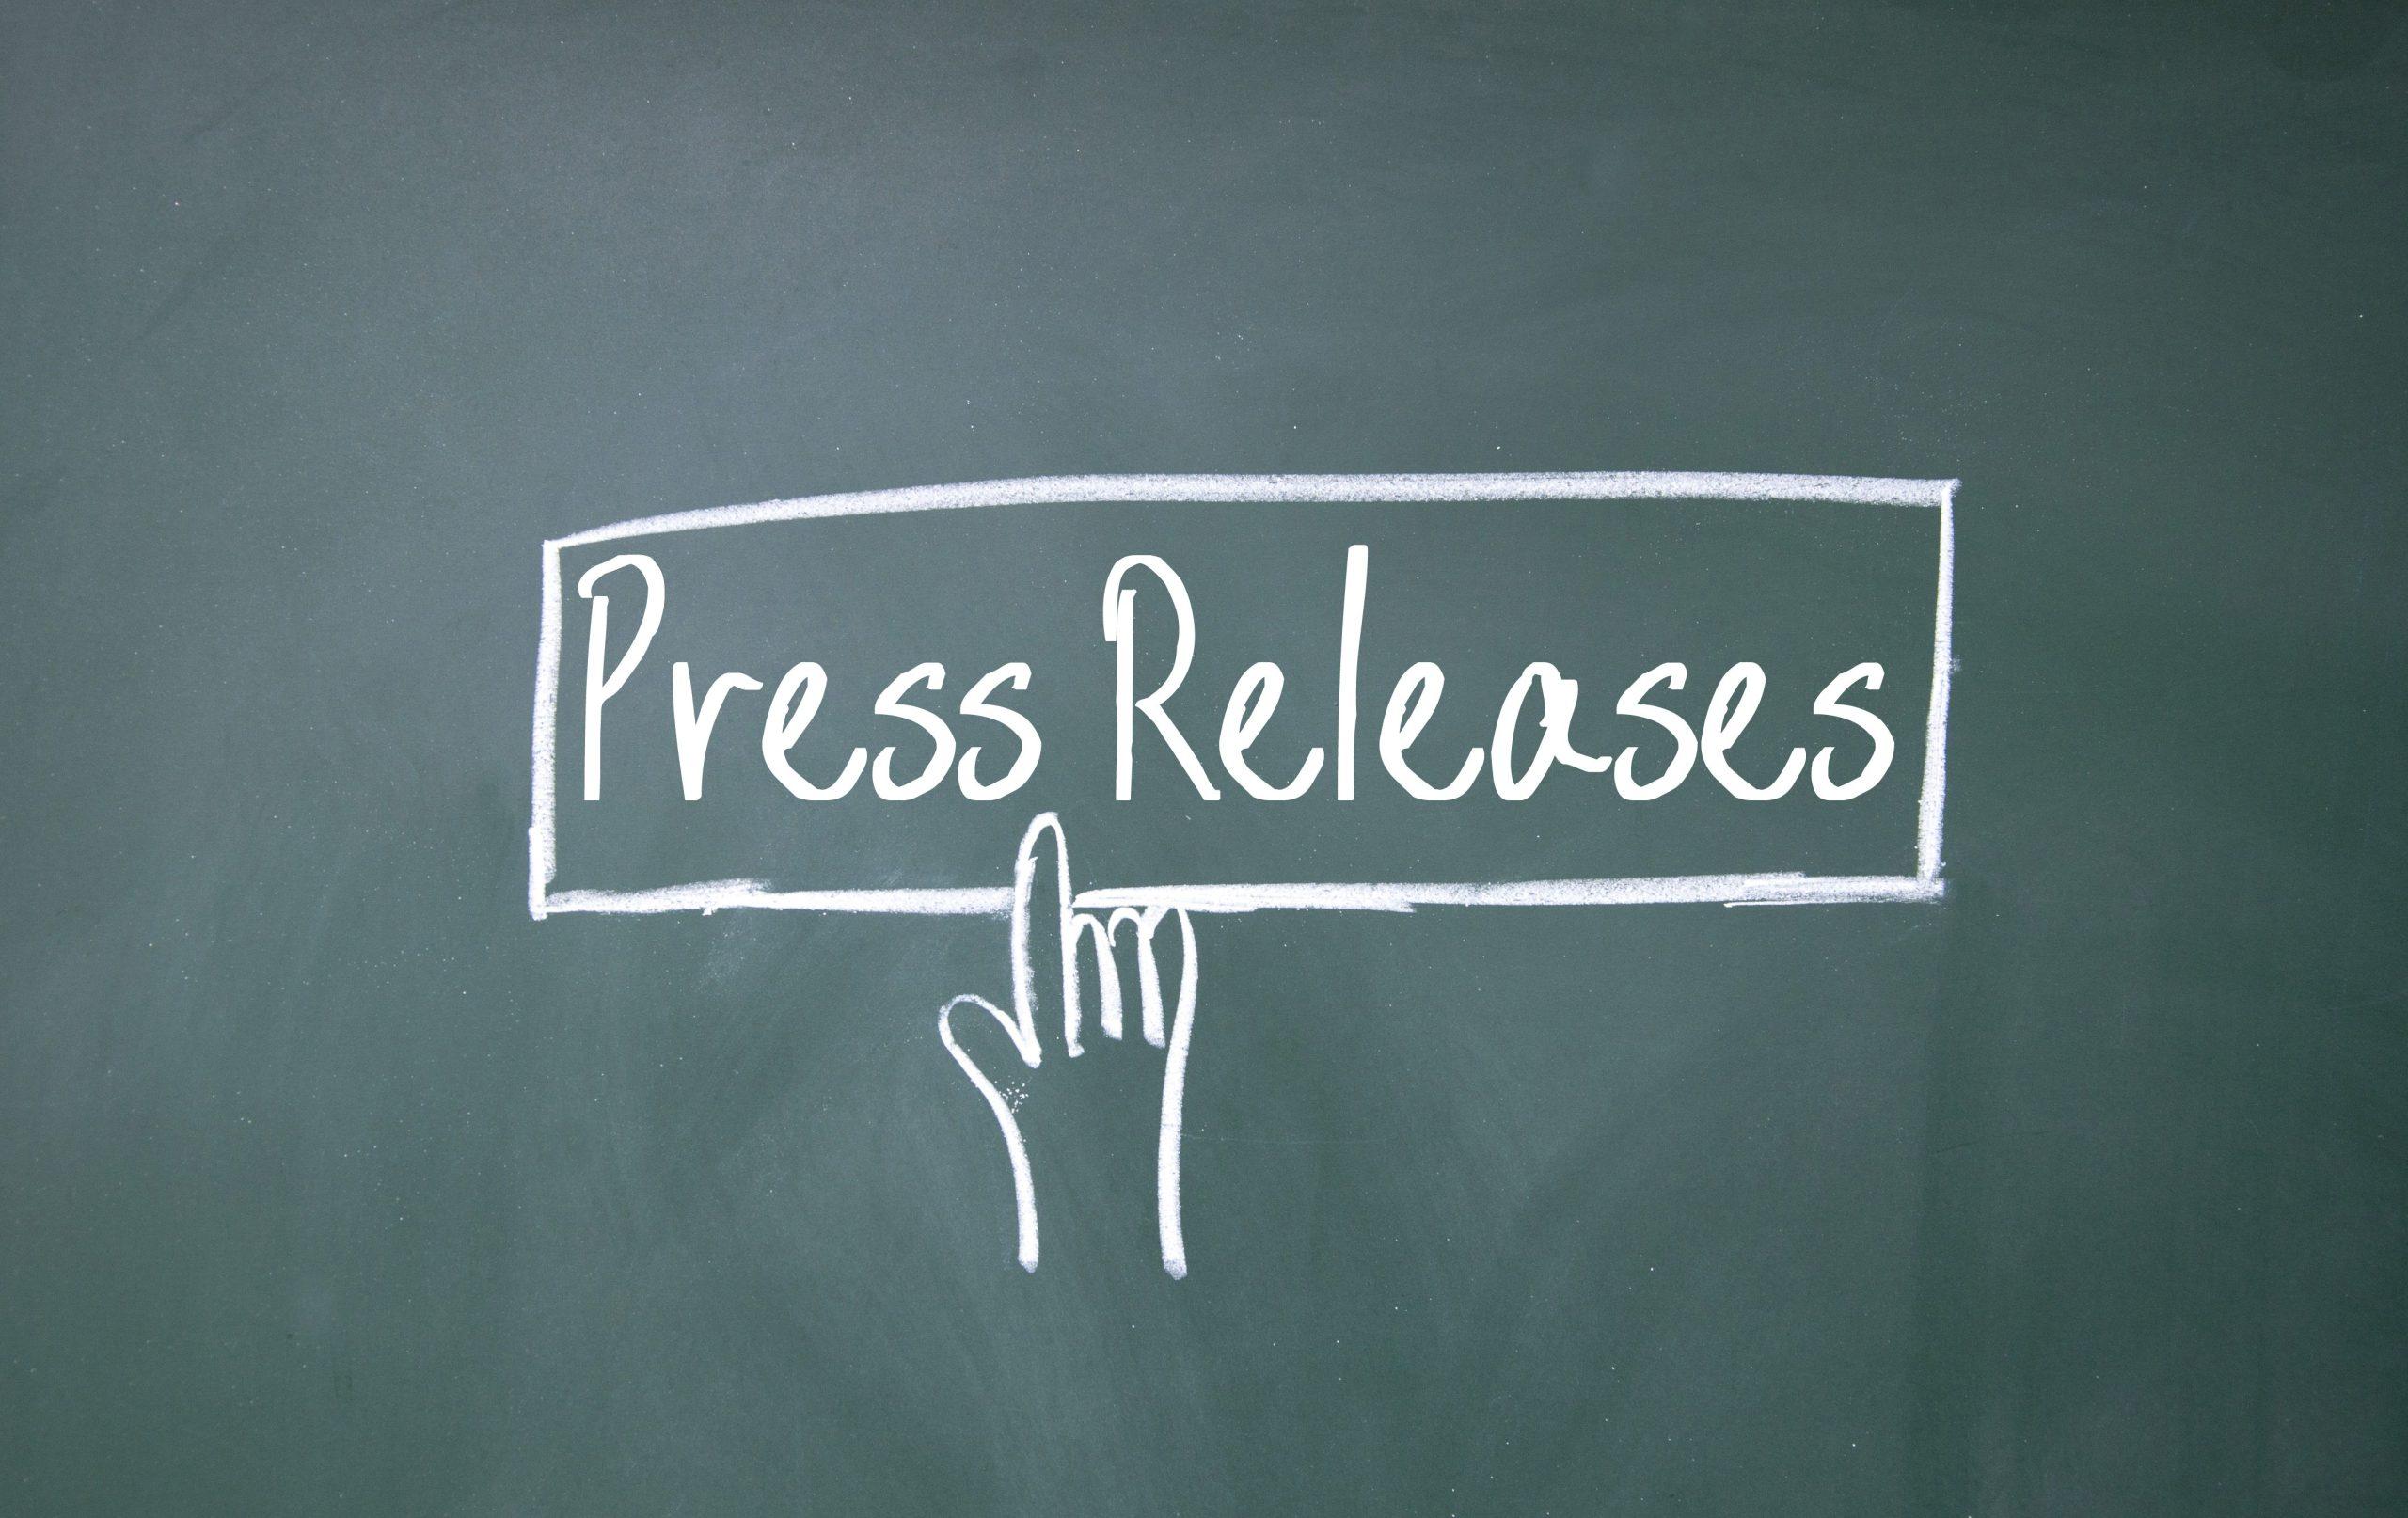 Benefits of Press Release